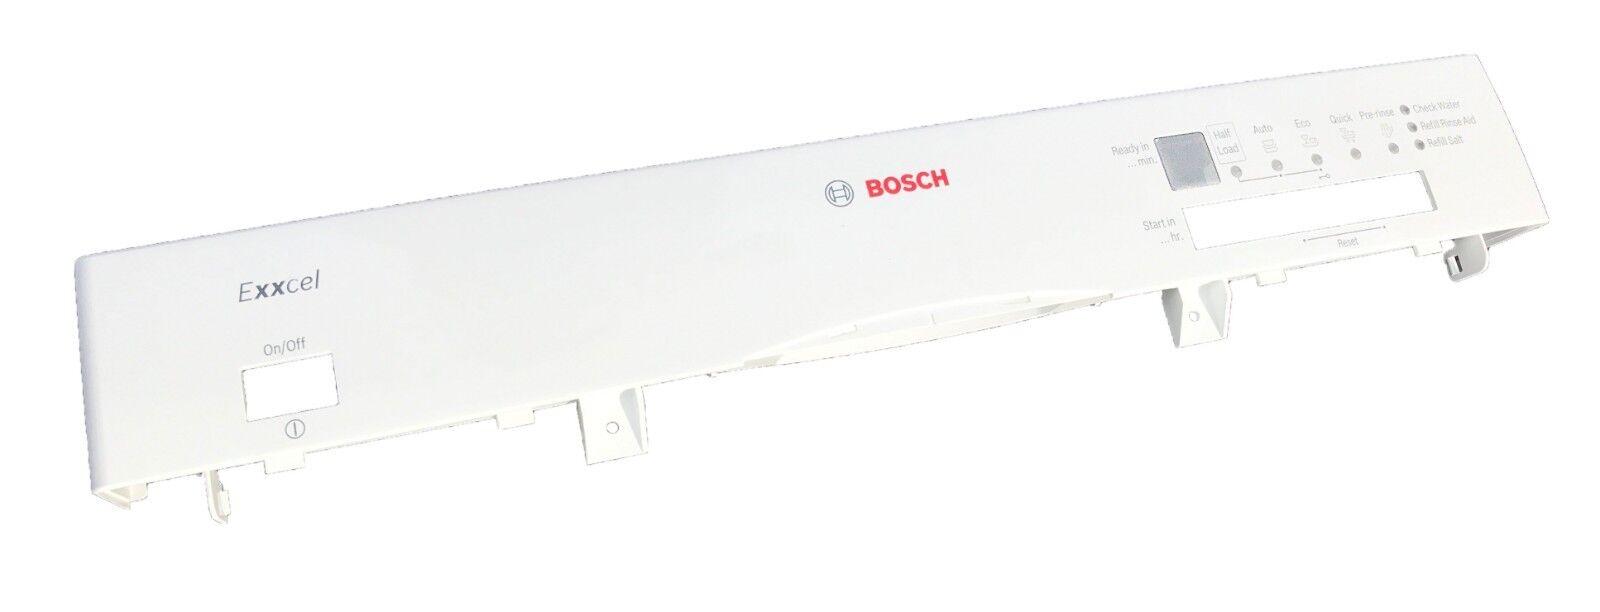 Bosch 00664837 Dishwasher Panel Frame